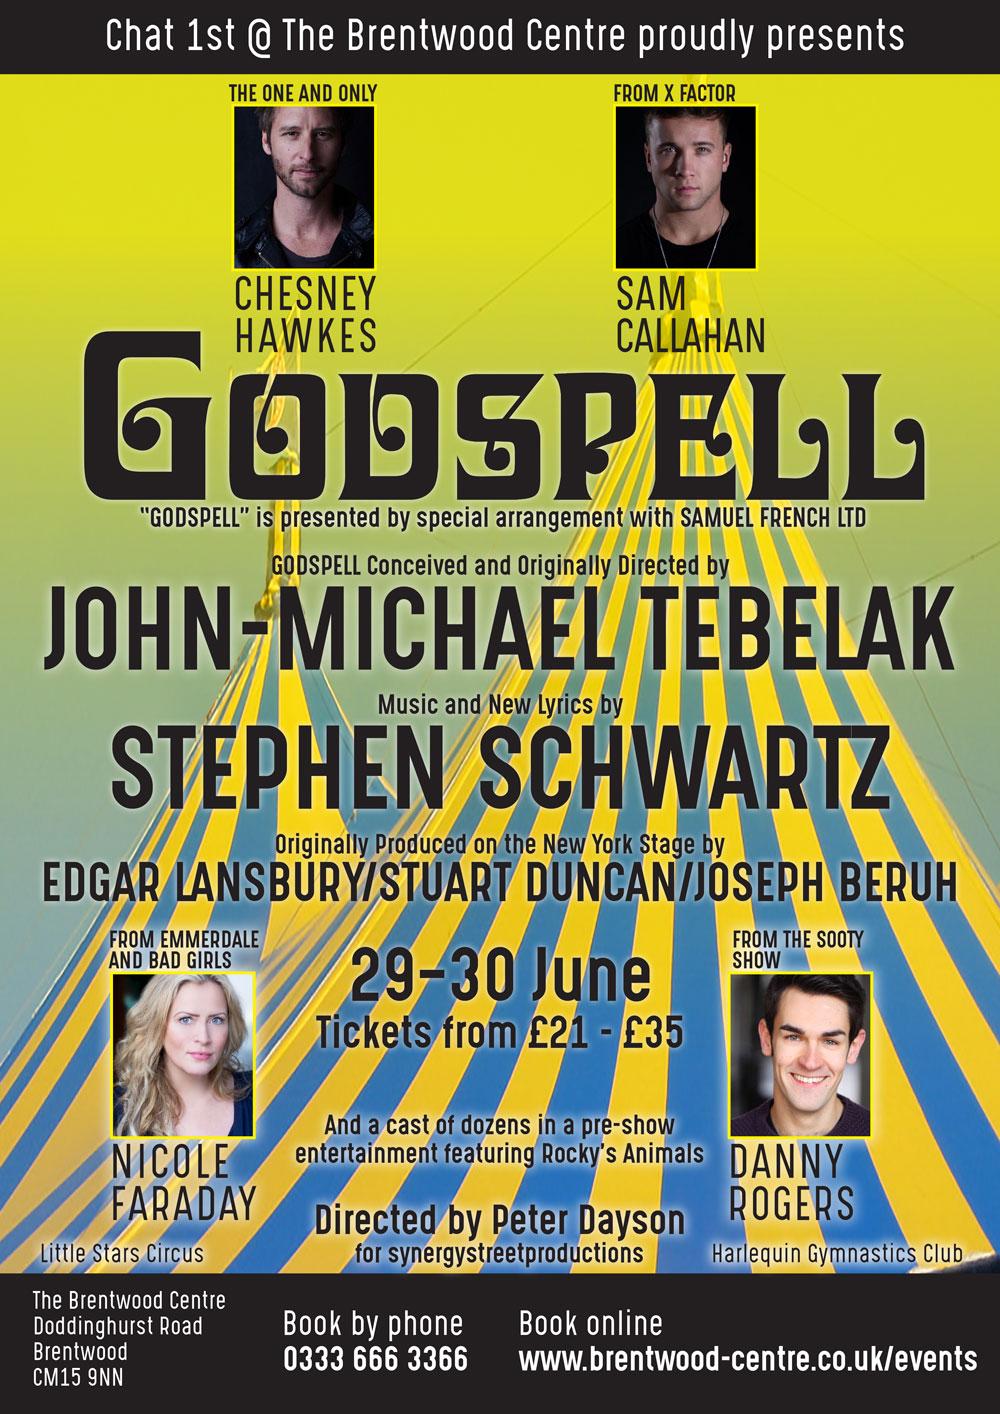 GODSPELL starring Chesney Hawkes banner image